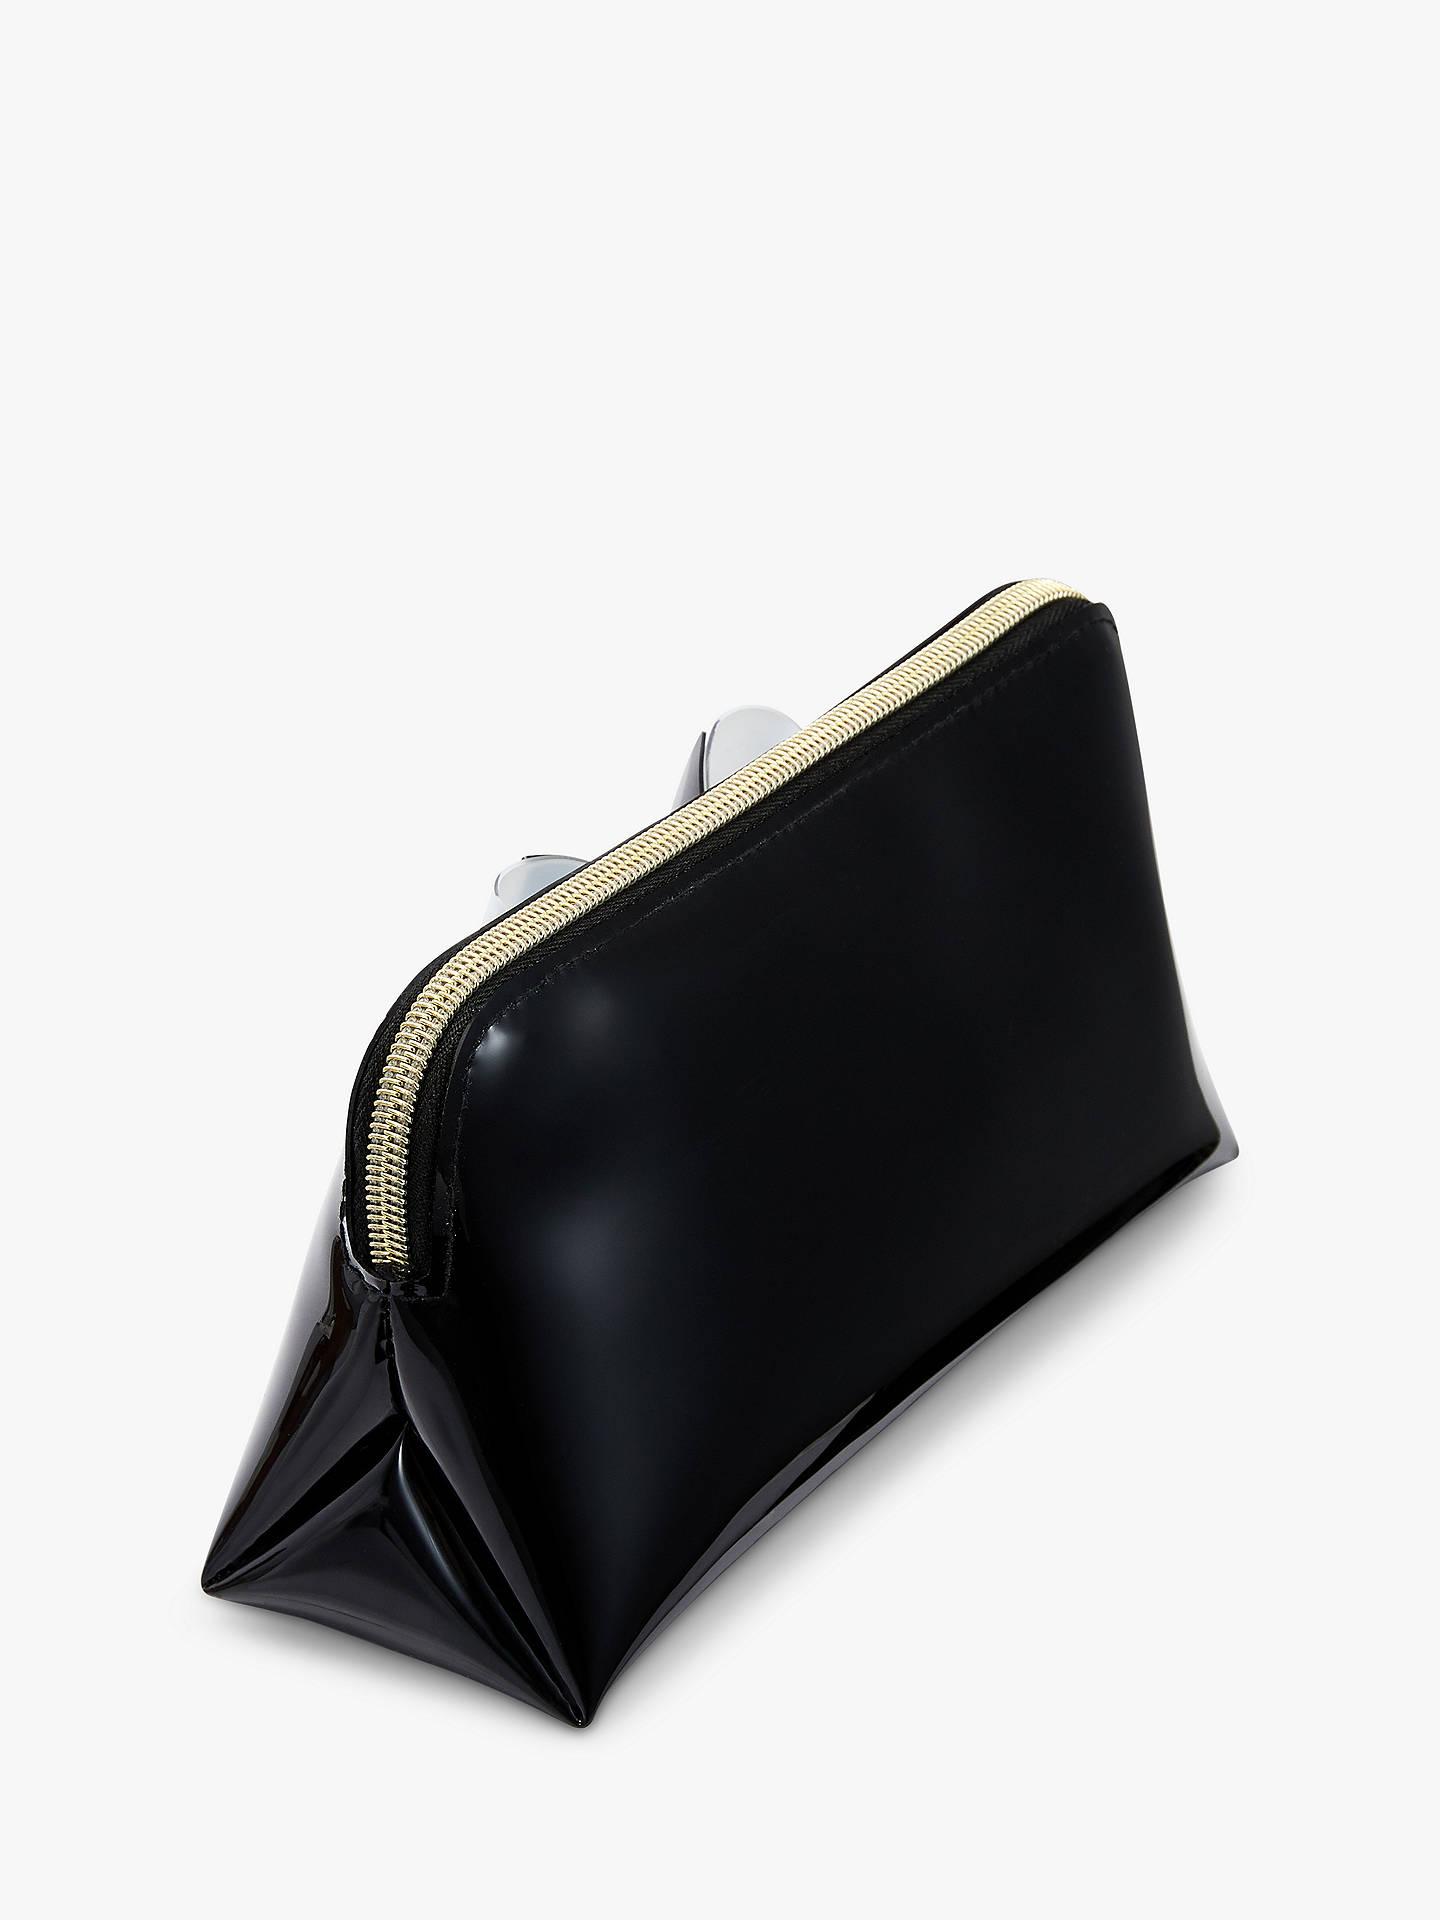 4c067048e7b6 Ted Baker Vivekah Bow Makeup Bag, Black